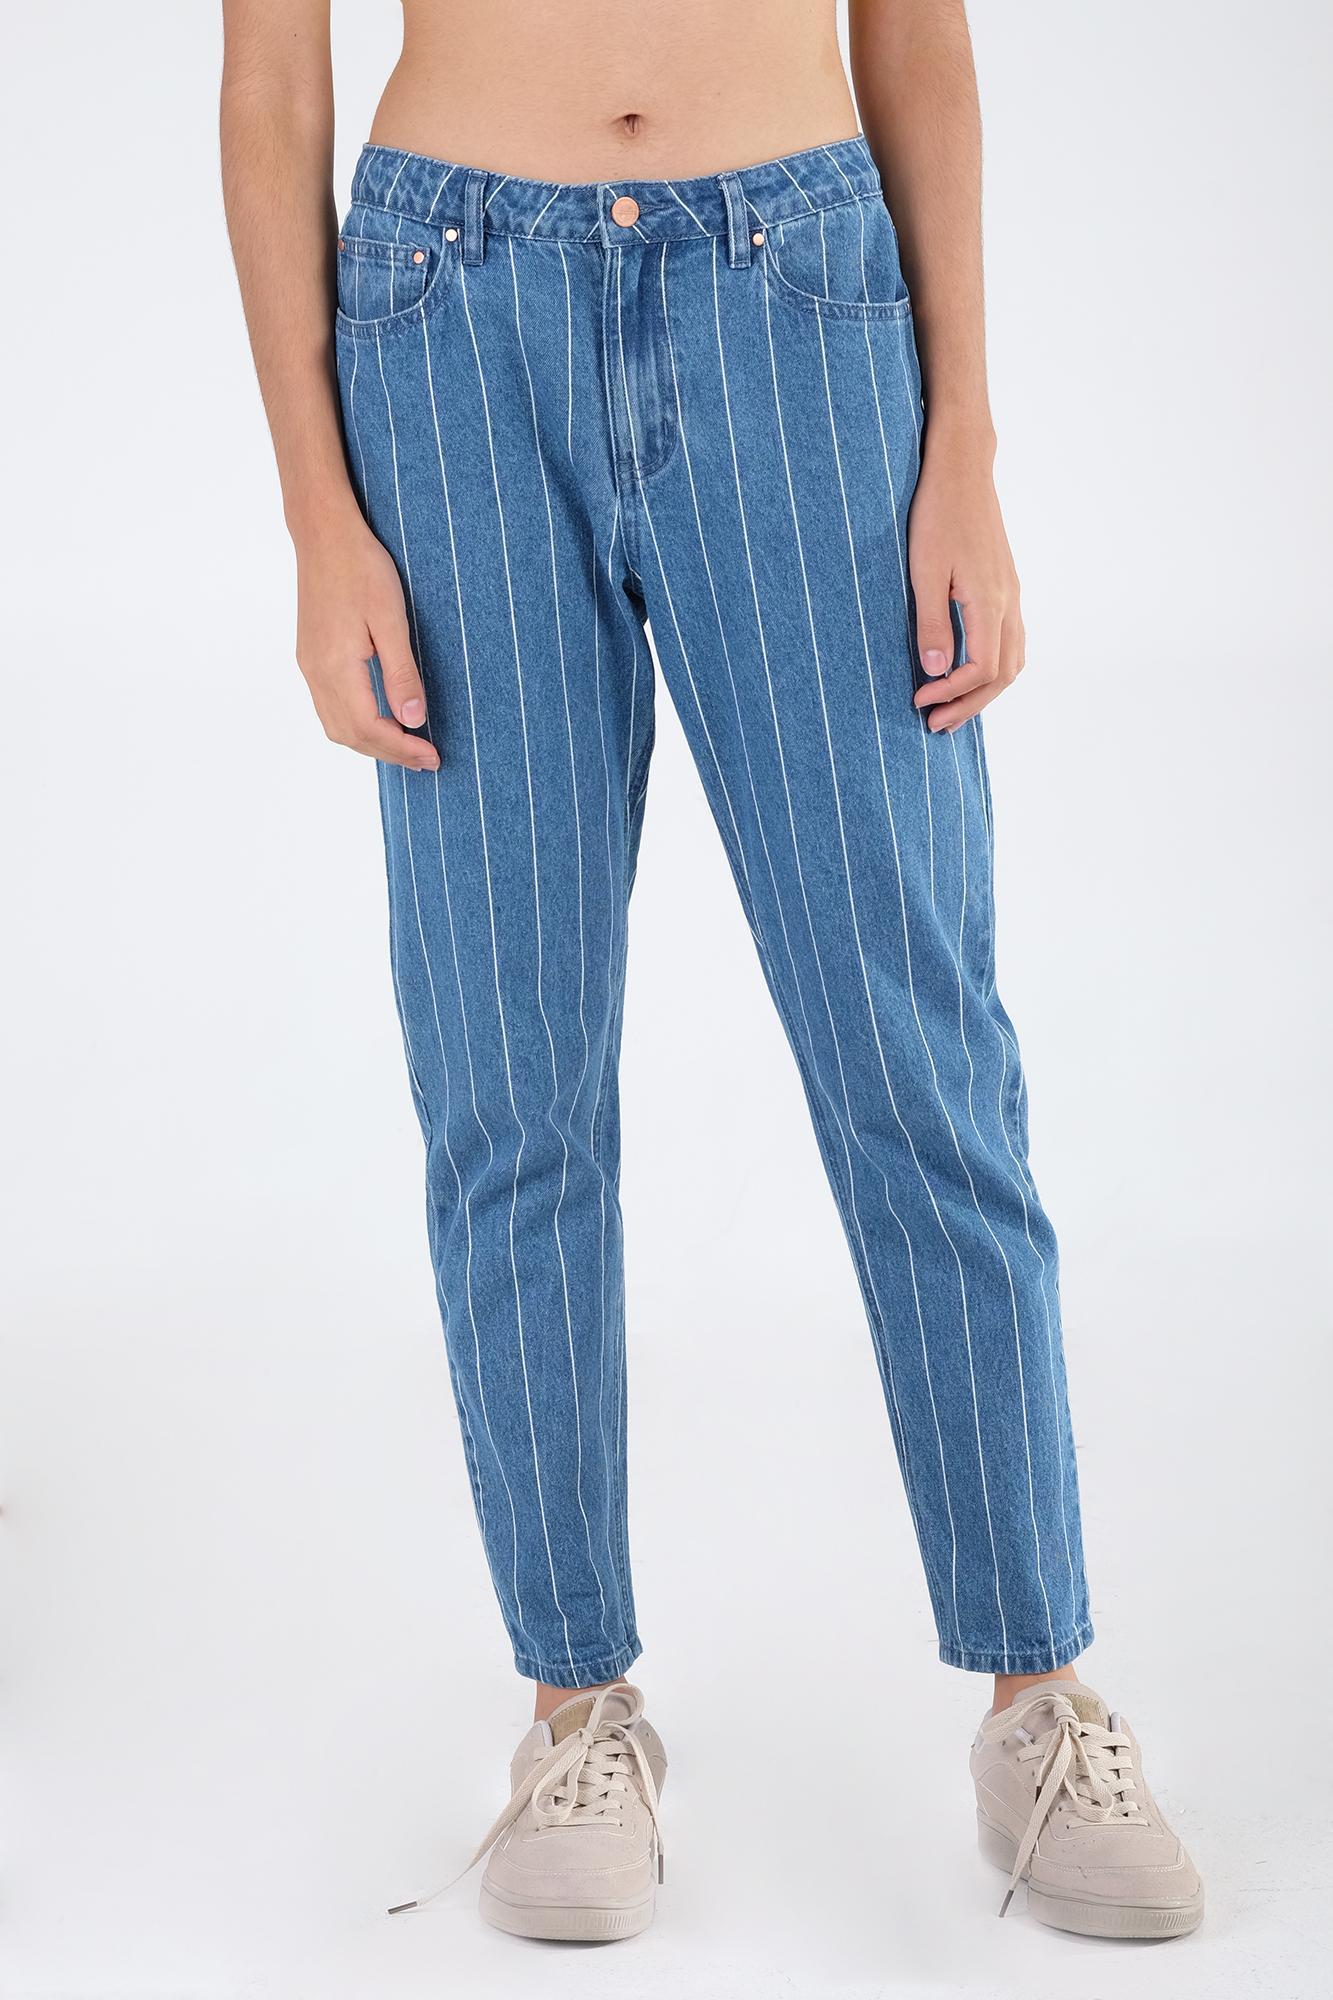 Penshoppe Jeans For Women Philippines Fashion Vintage Skin Rip Off Stretch Soft Slim In Medium Wash Blue